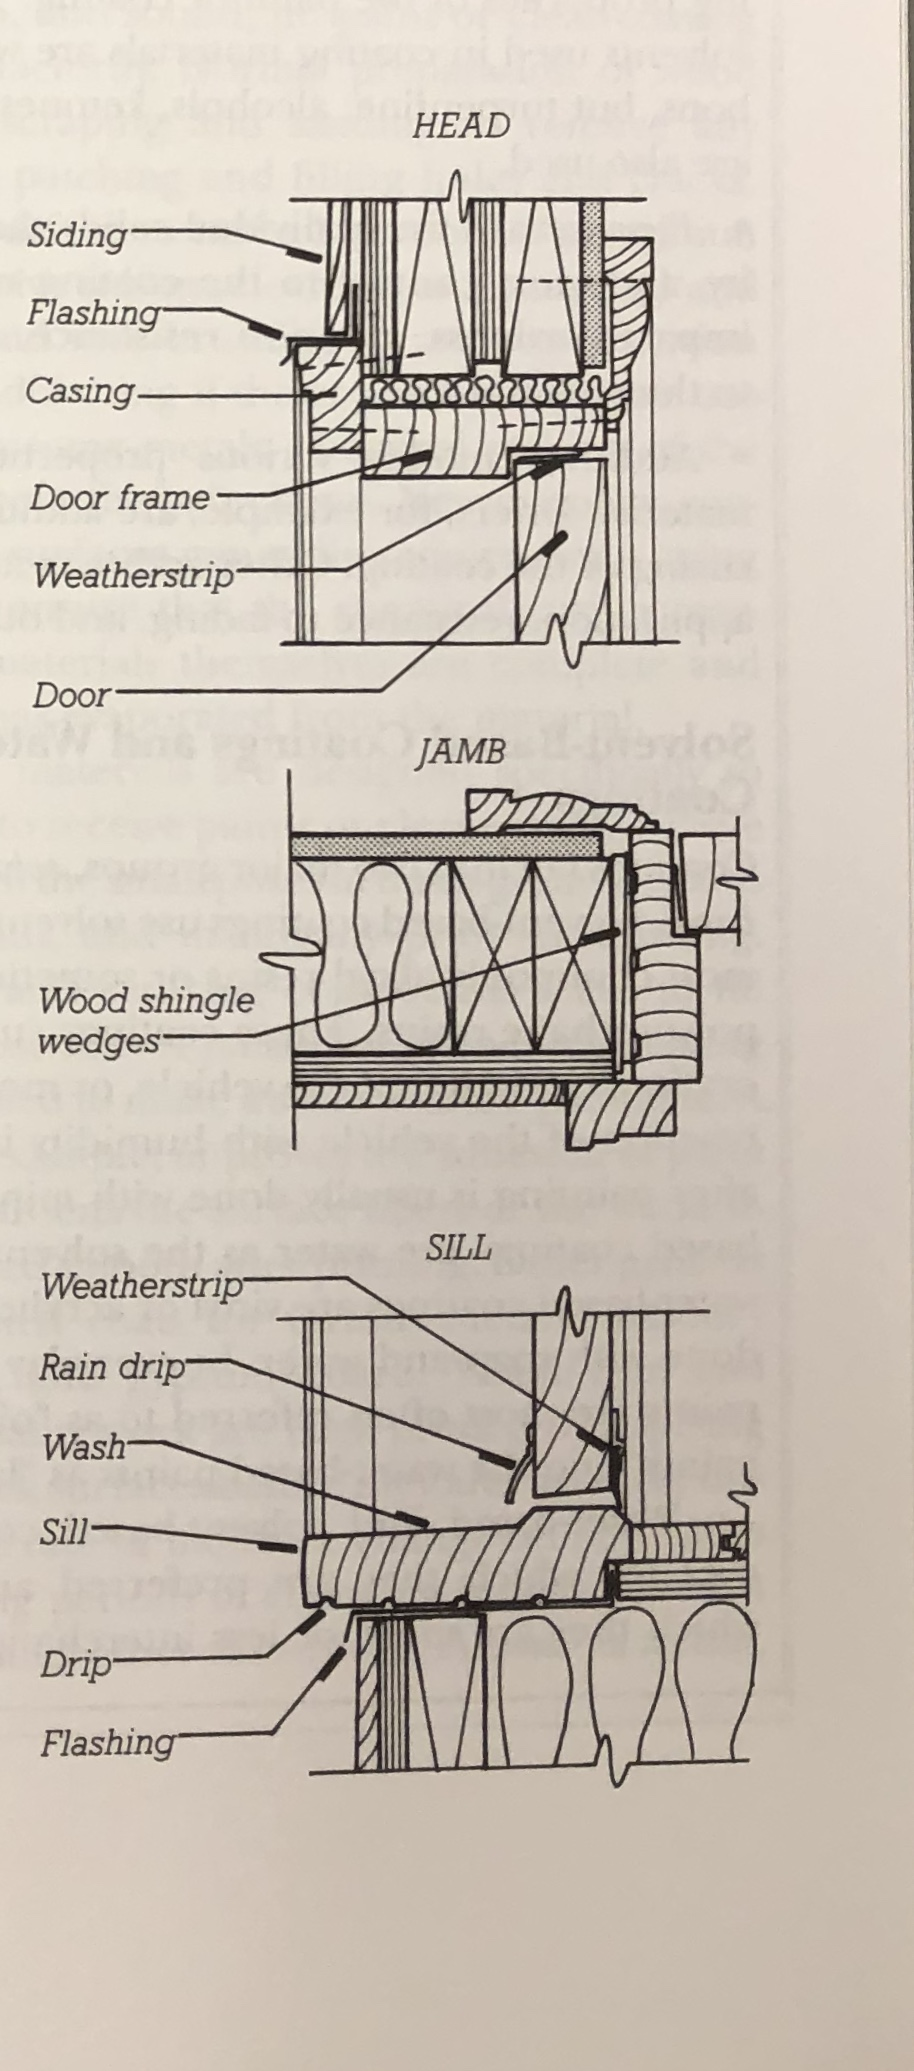 Fundamentals of Building Construction, Fig 6.15